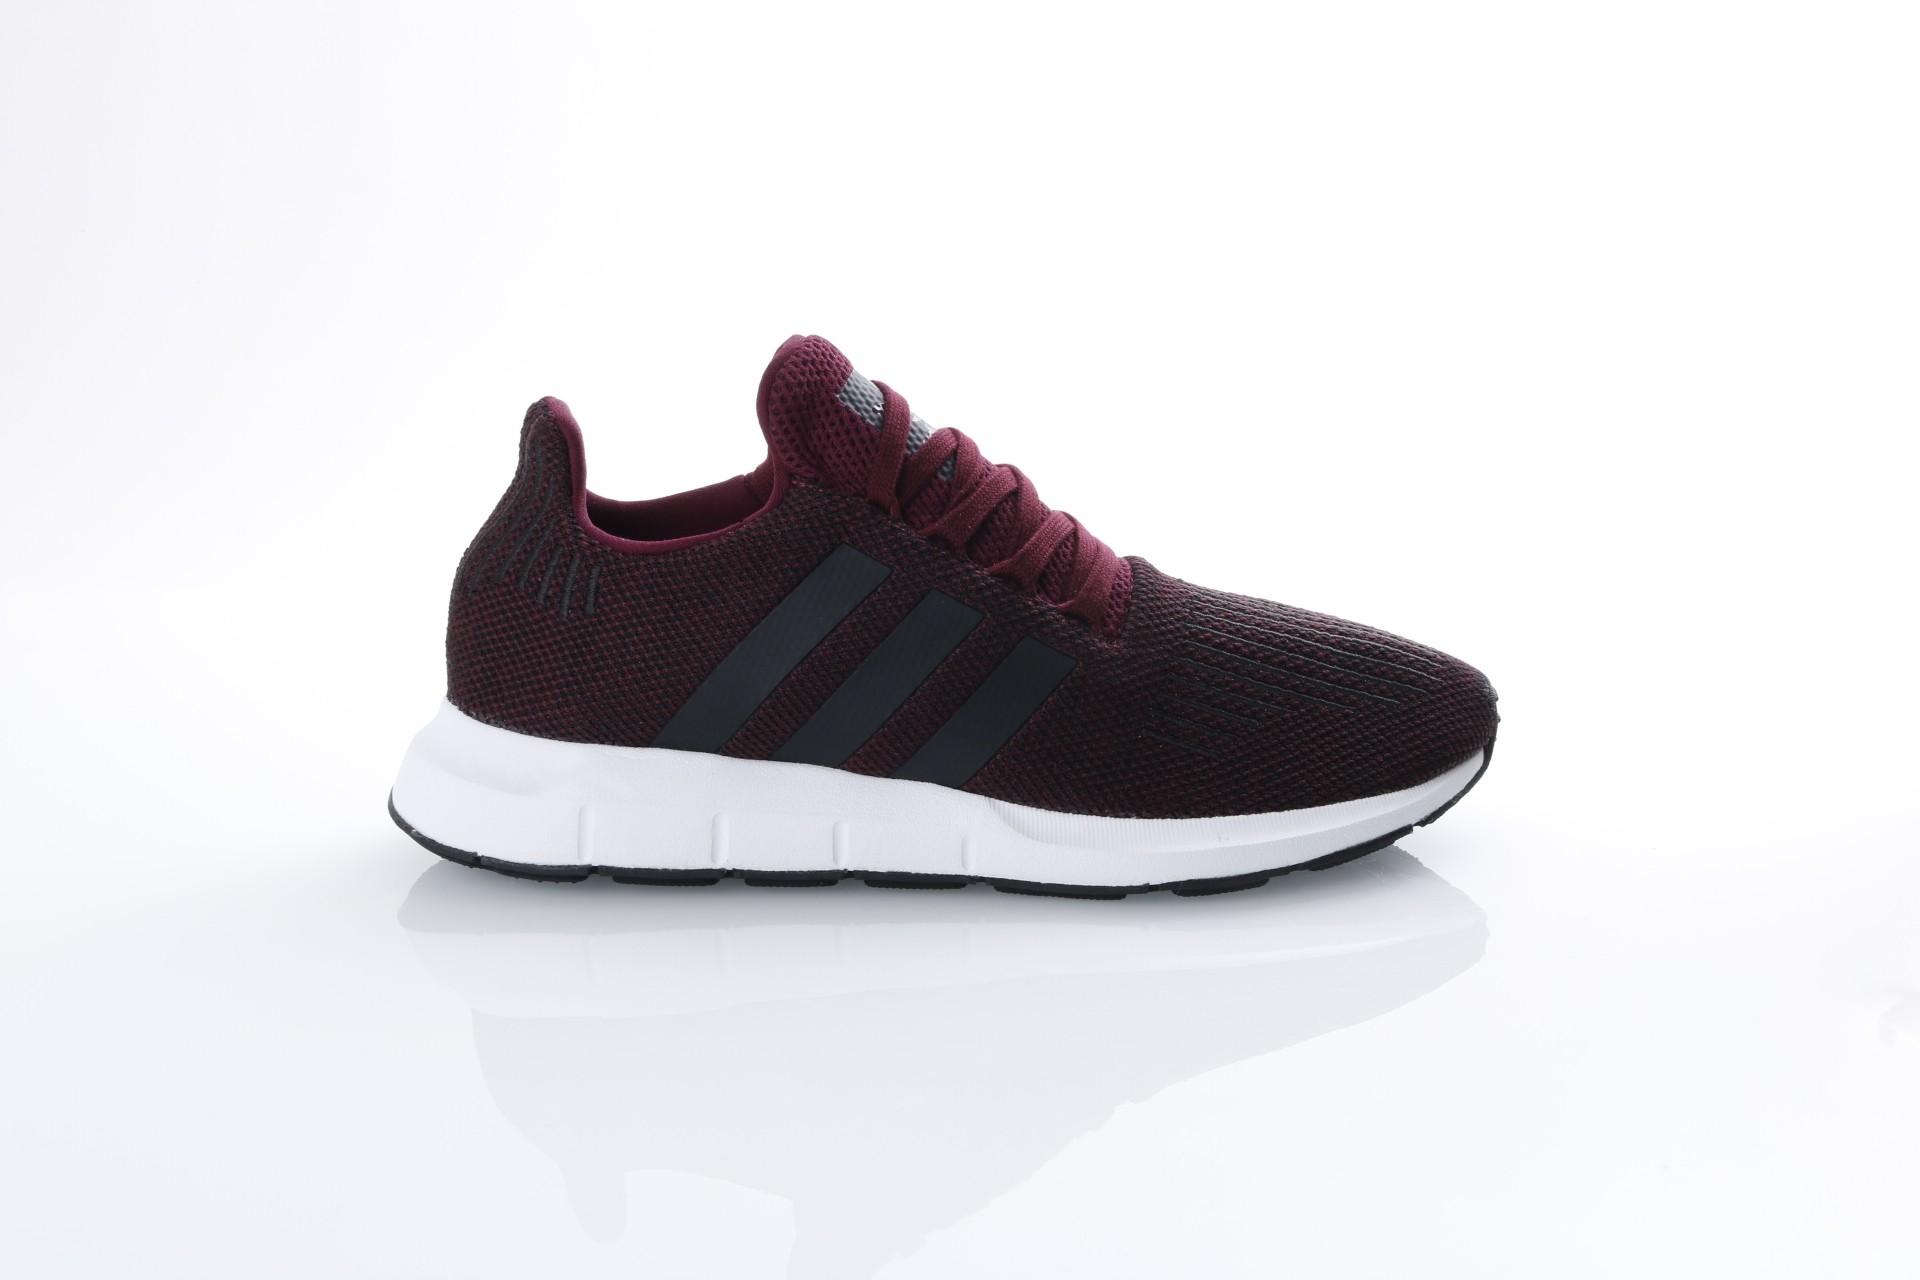 Foto van Adidas Originals CQ2118 Sneakers Swift run Bruin